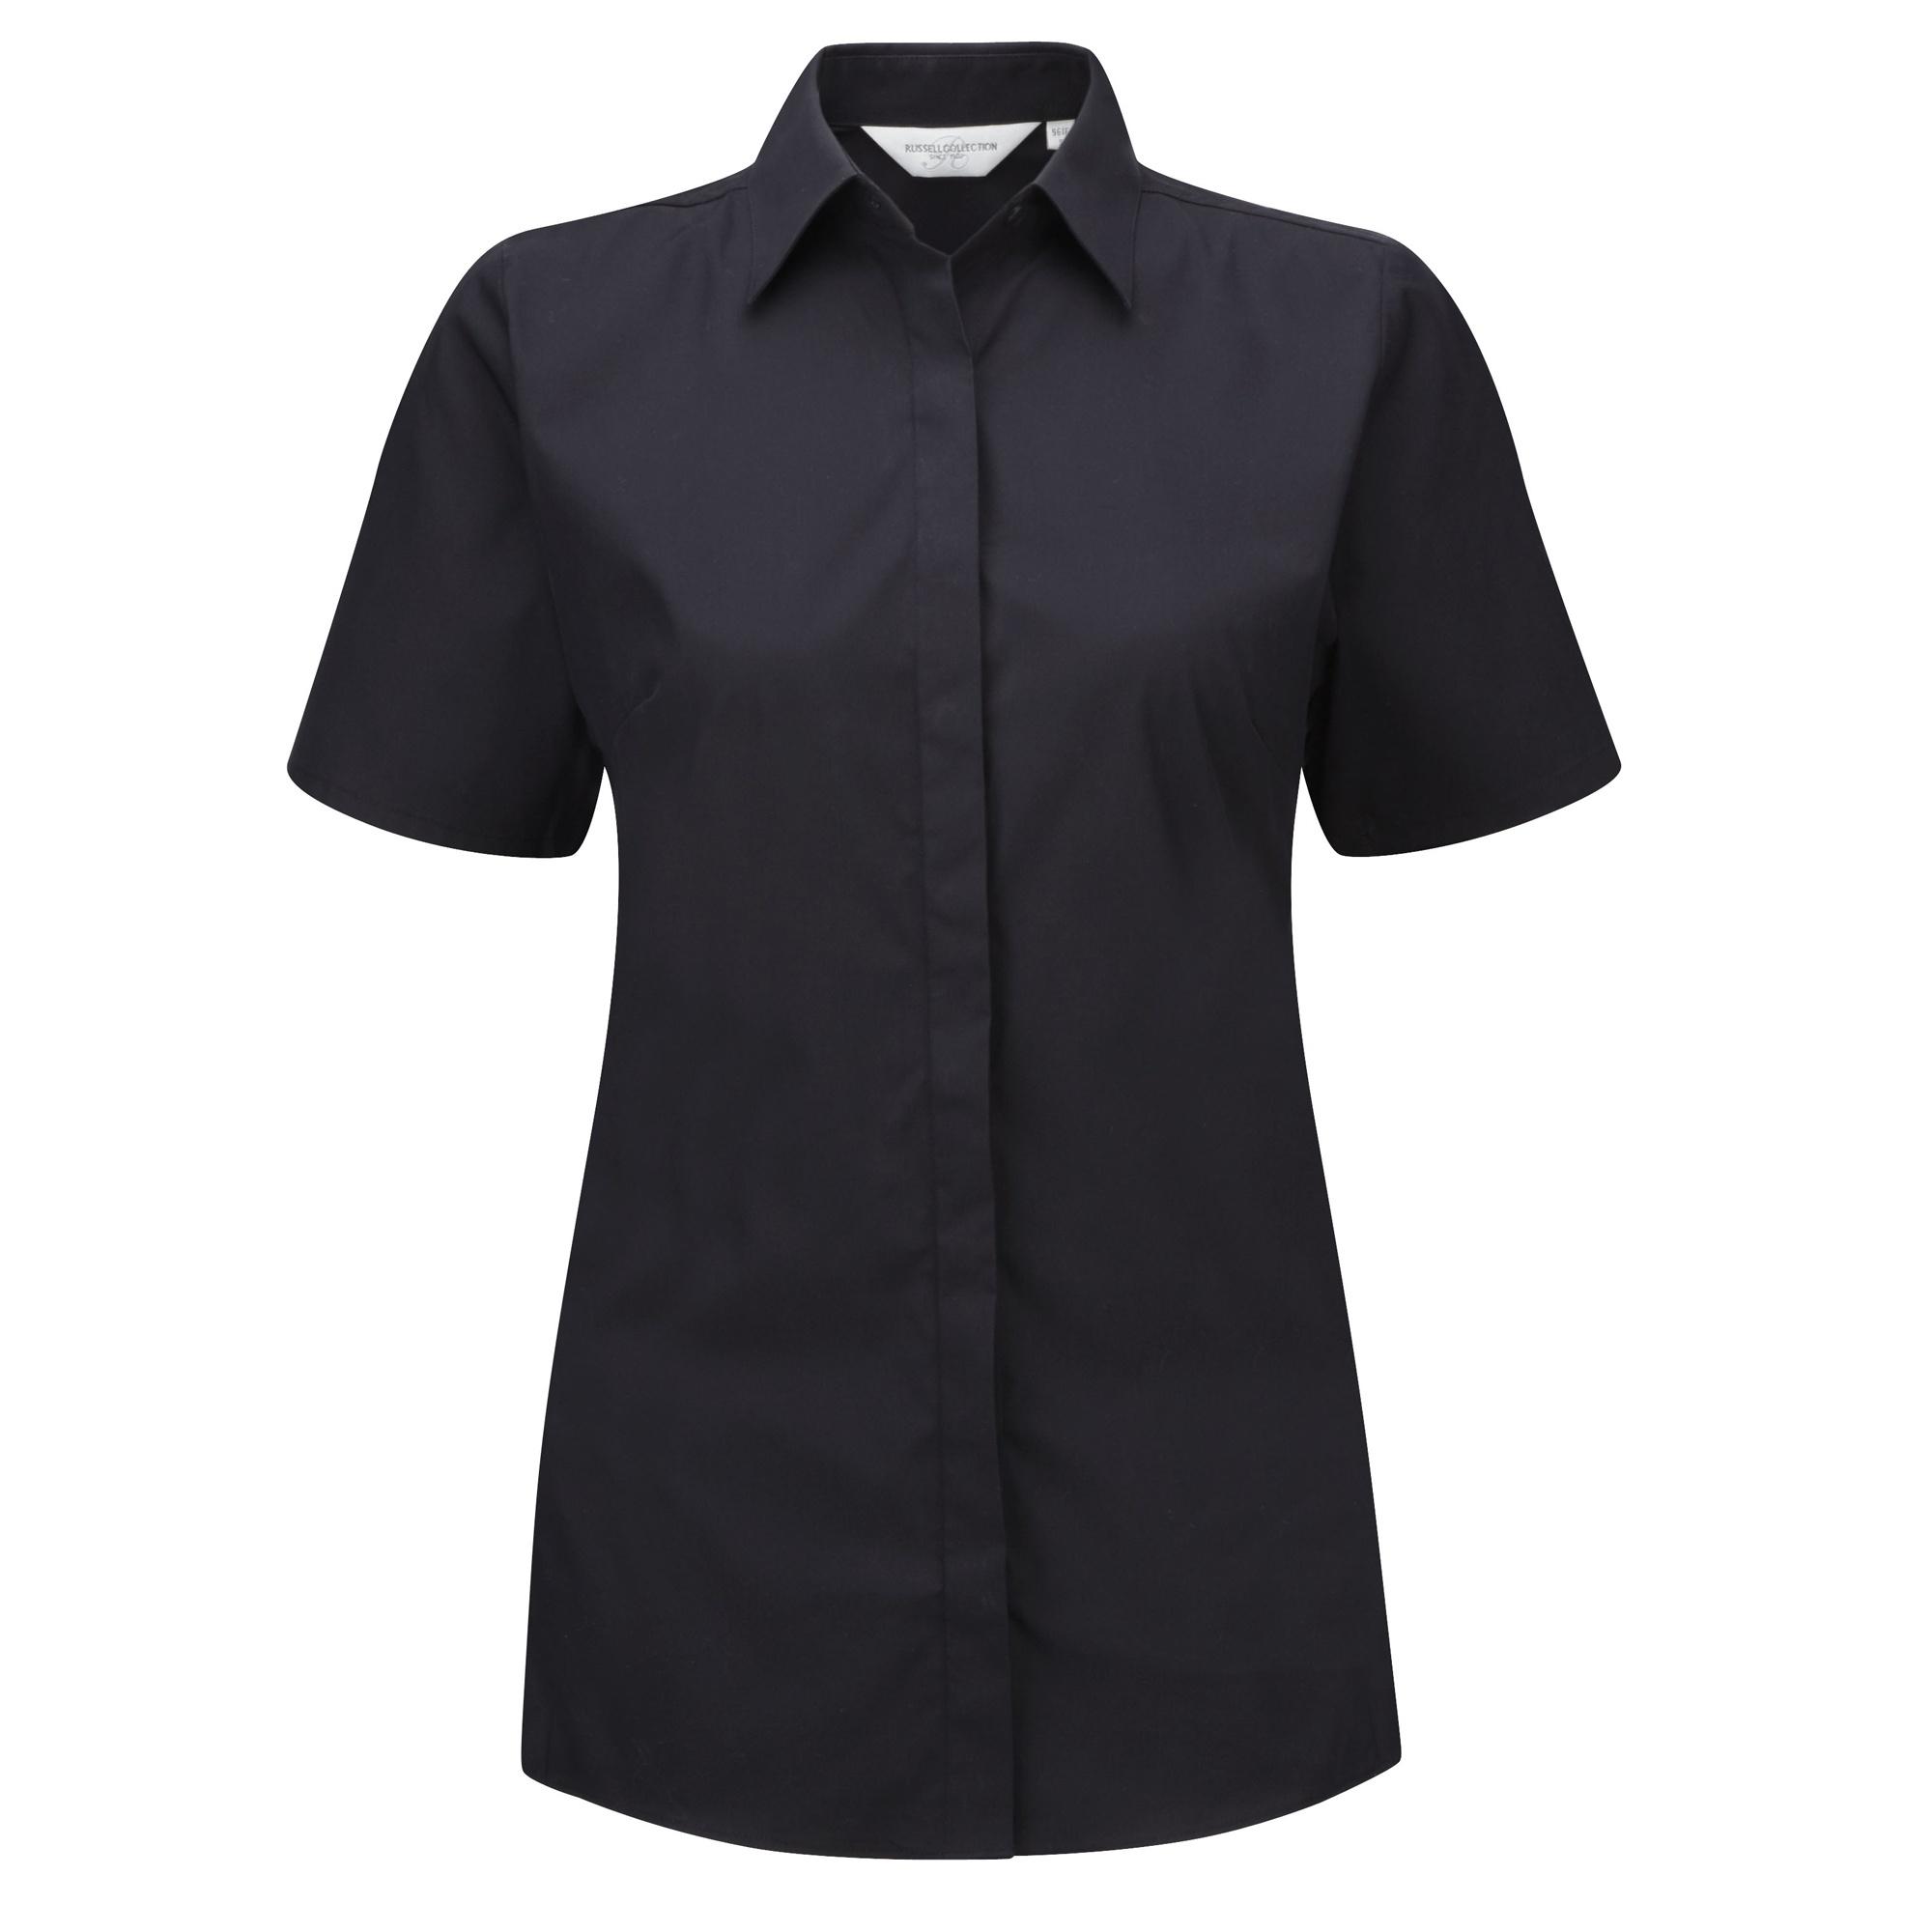 Russell Ladies Short Sleeve Stretch Moisture Management Work Shirt (L) (Black)